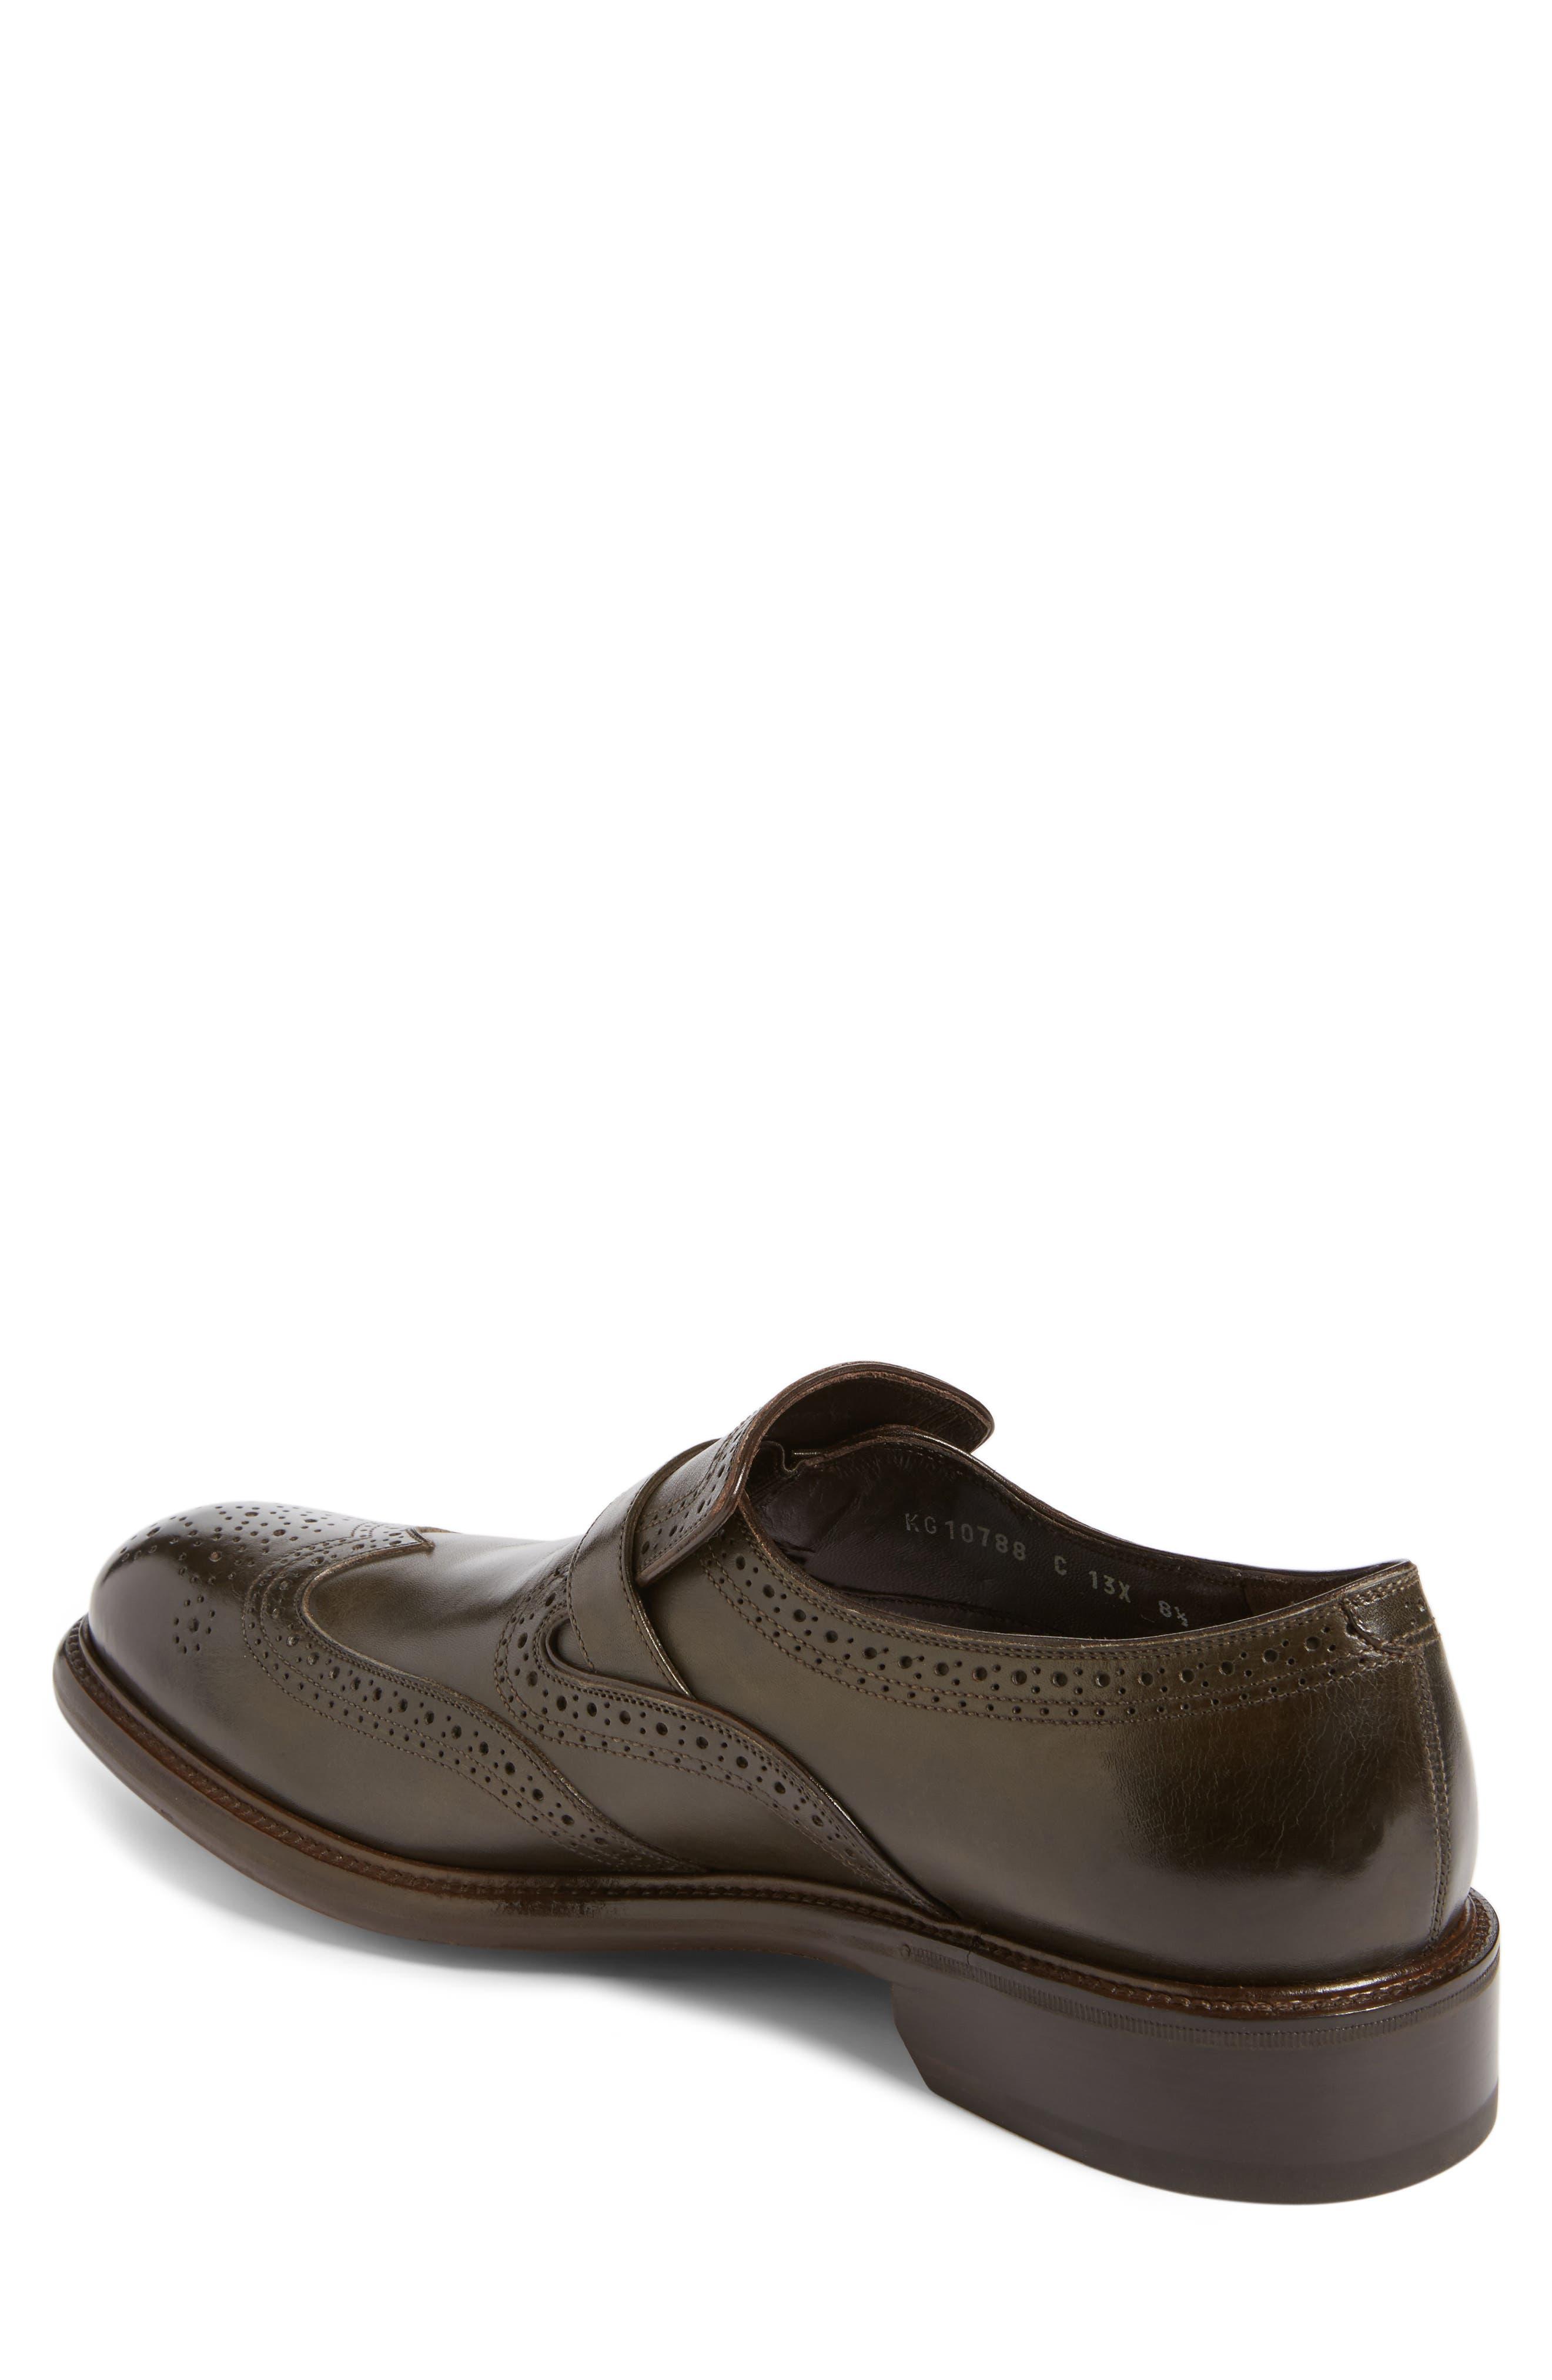 Alternate Image 2  - Salvatore Ferragamo Monk Strap Shoe (Men)